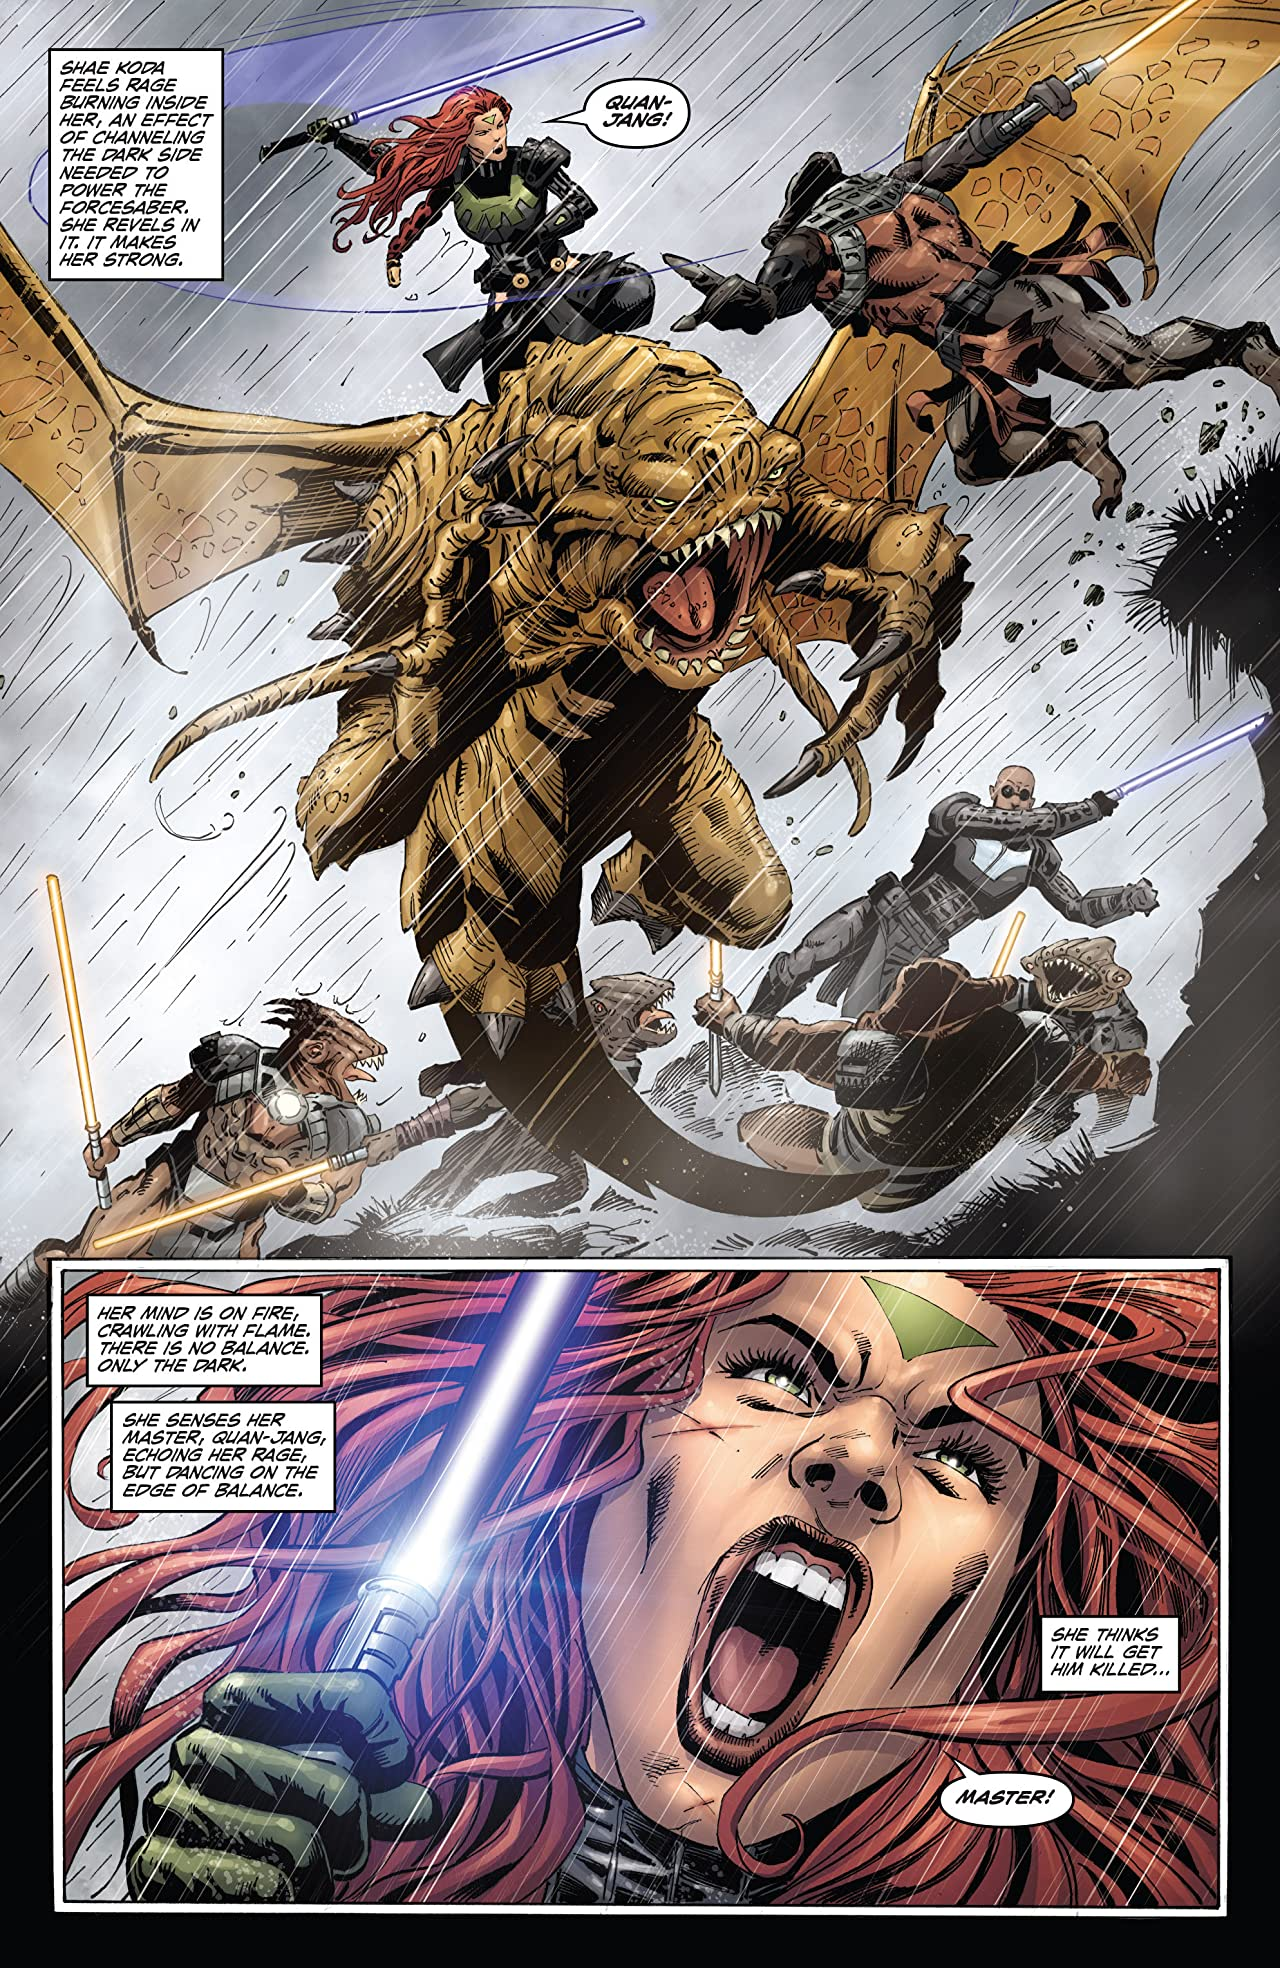 Star Wars: Dawn of the Jedi - Force War (2013-2014) #3 (of 5)